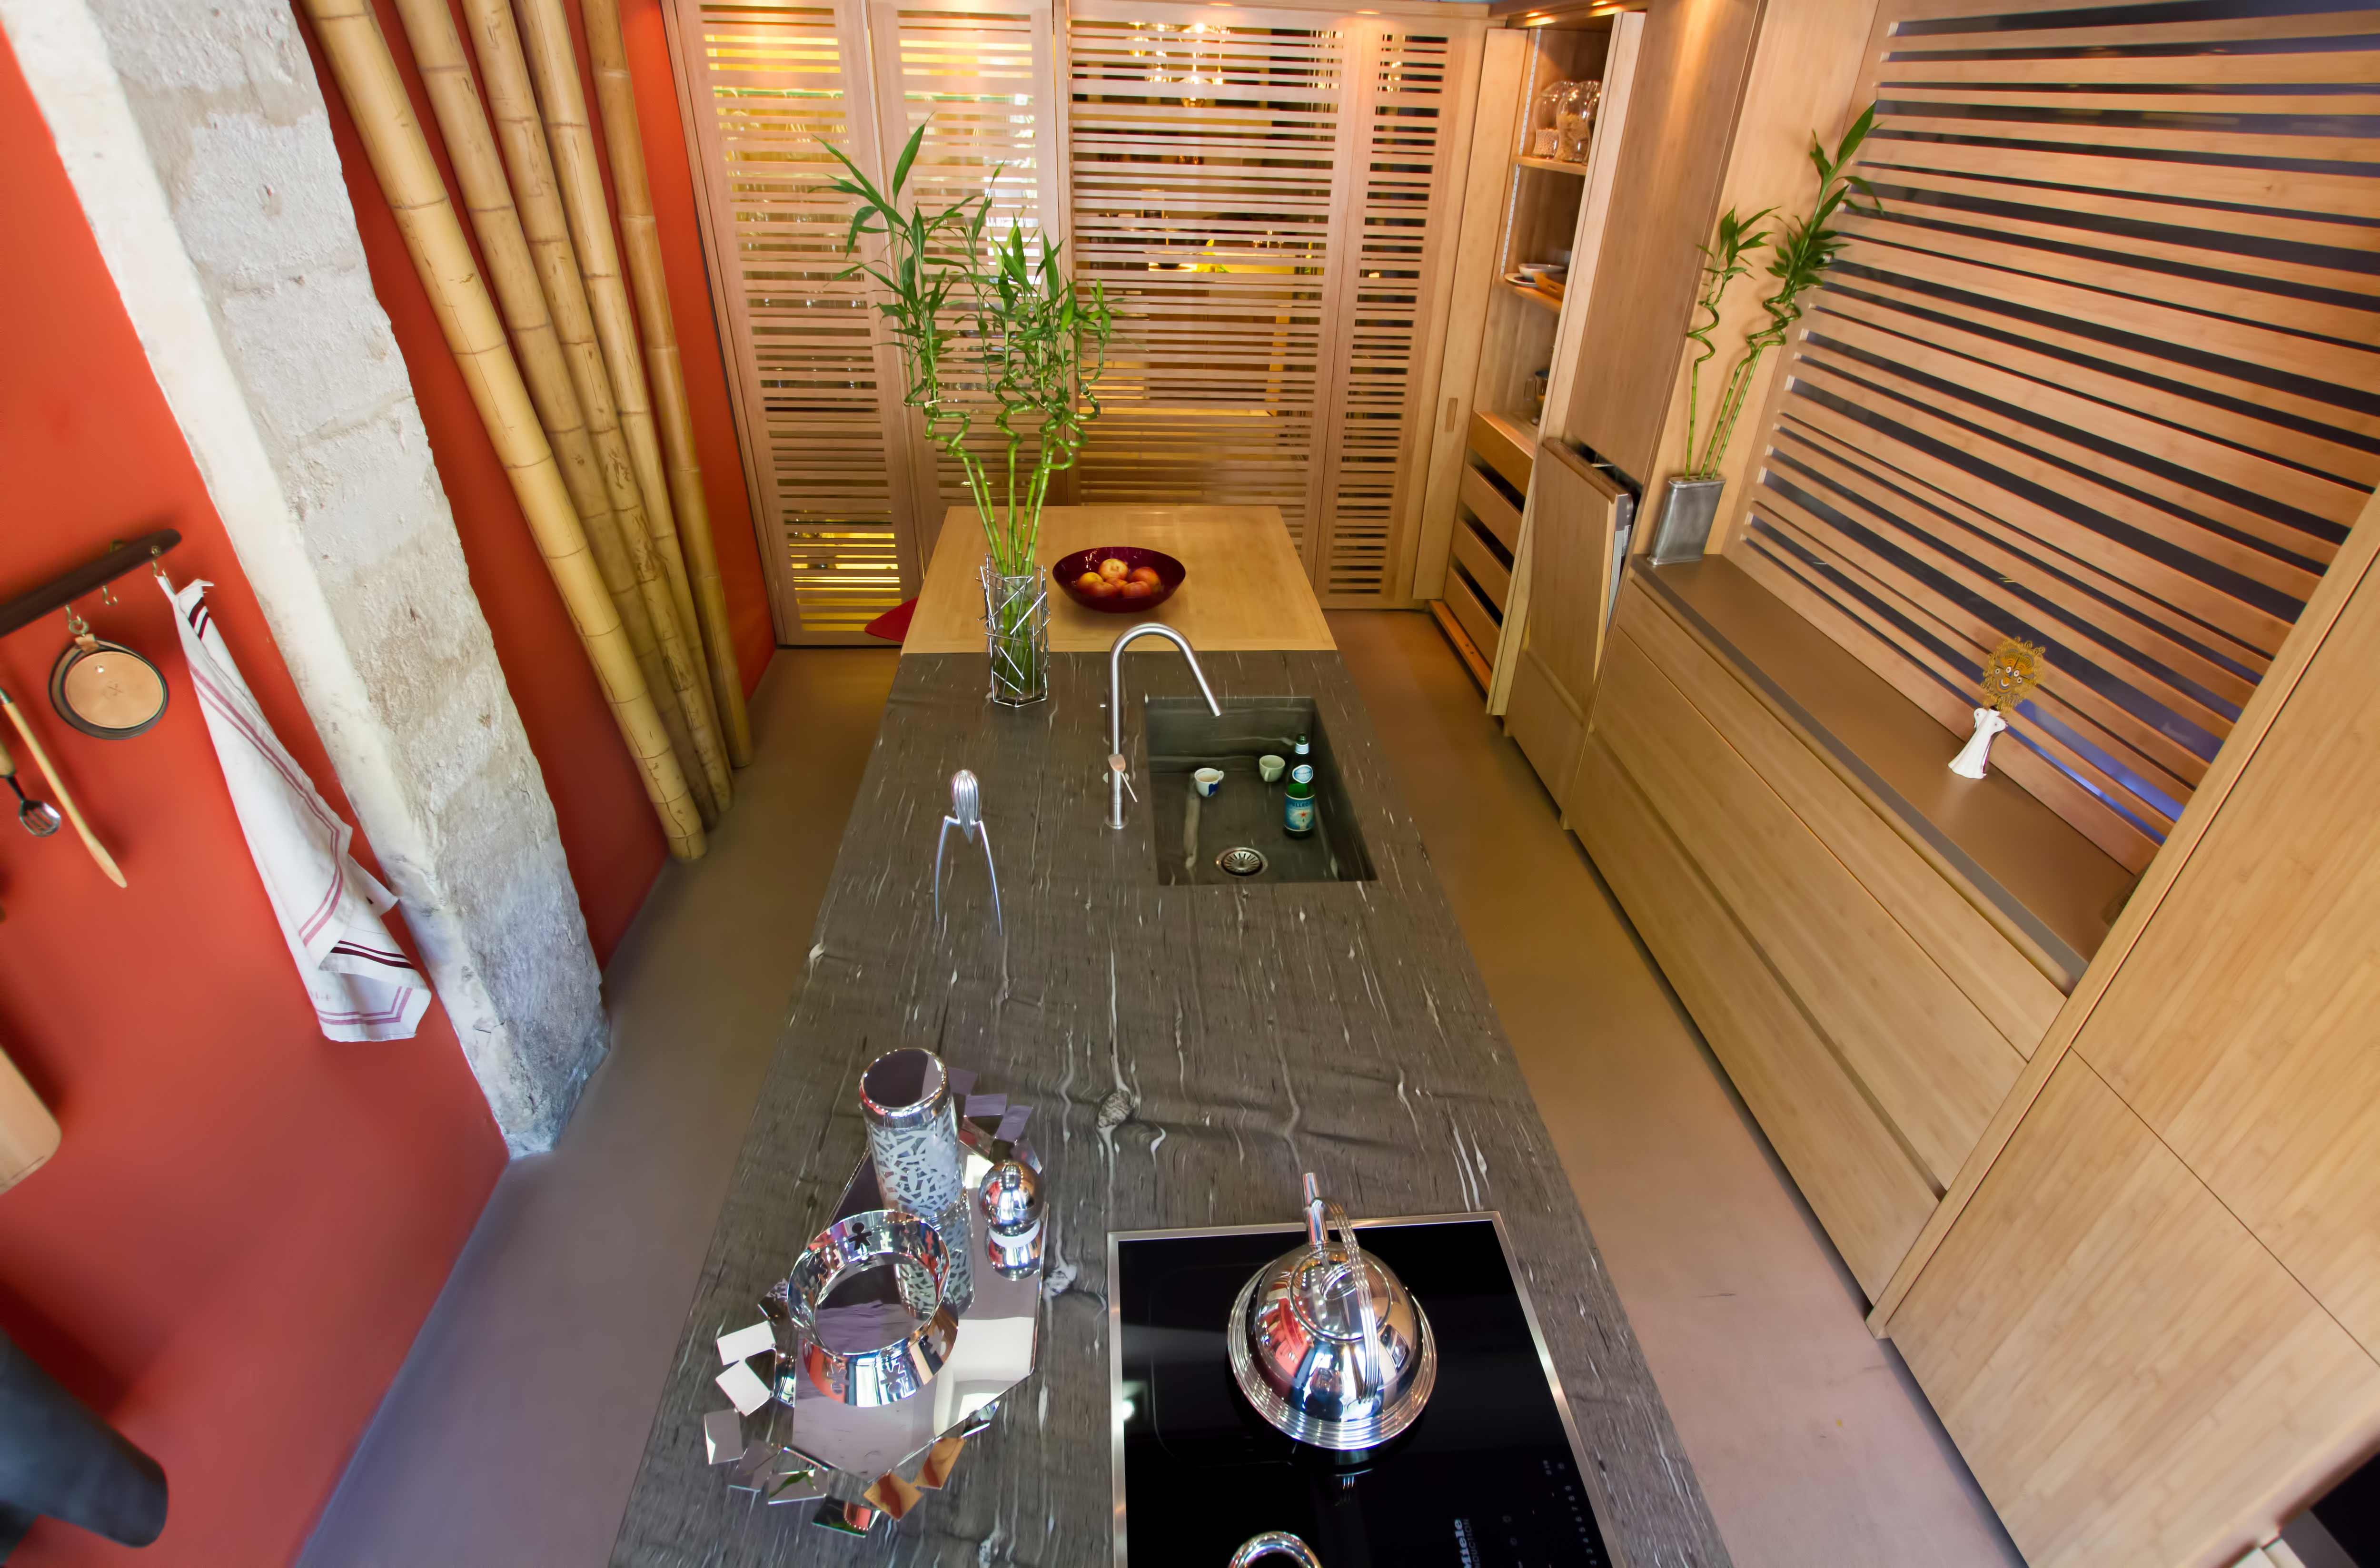 magasin avignon 16 cuisines mouvement. Black Bedroom Furniture Sets. Home Design Ideas